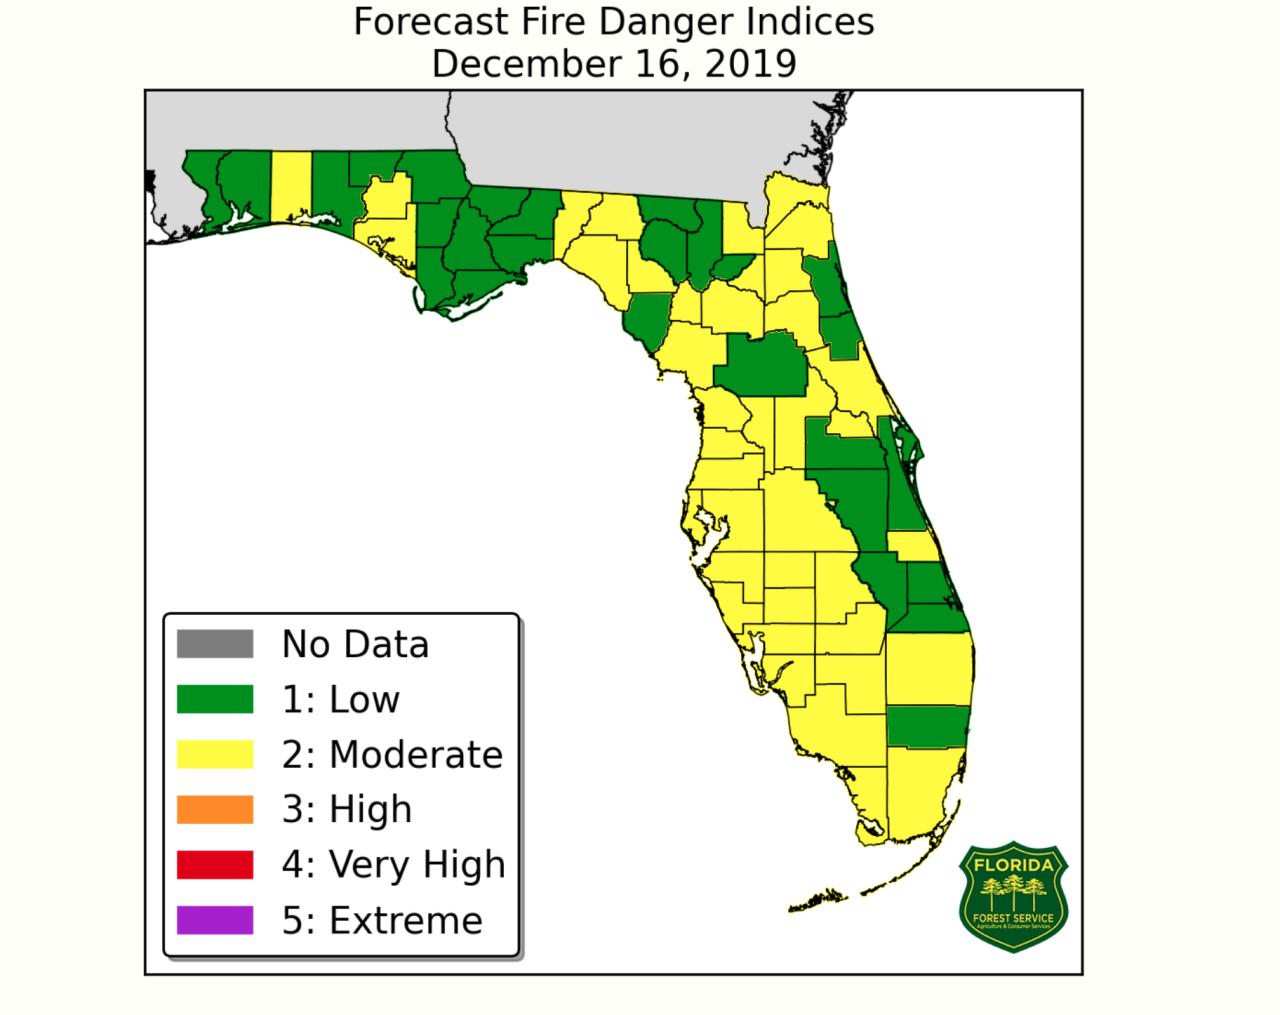 Florida Forest Service Fire Danger Map